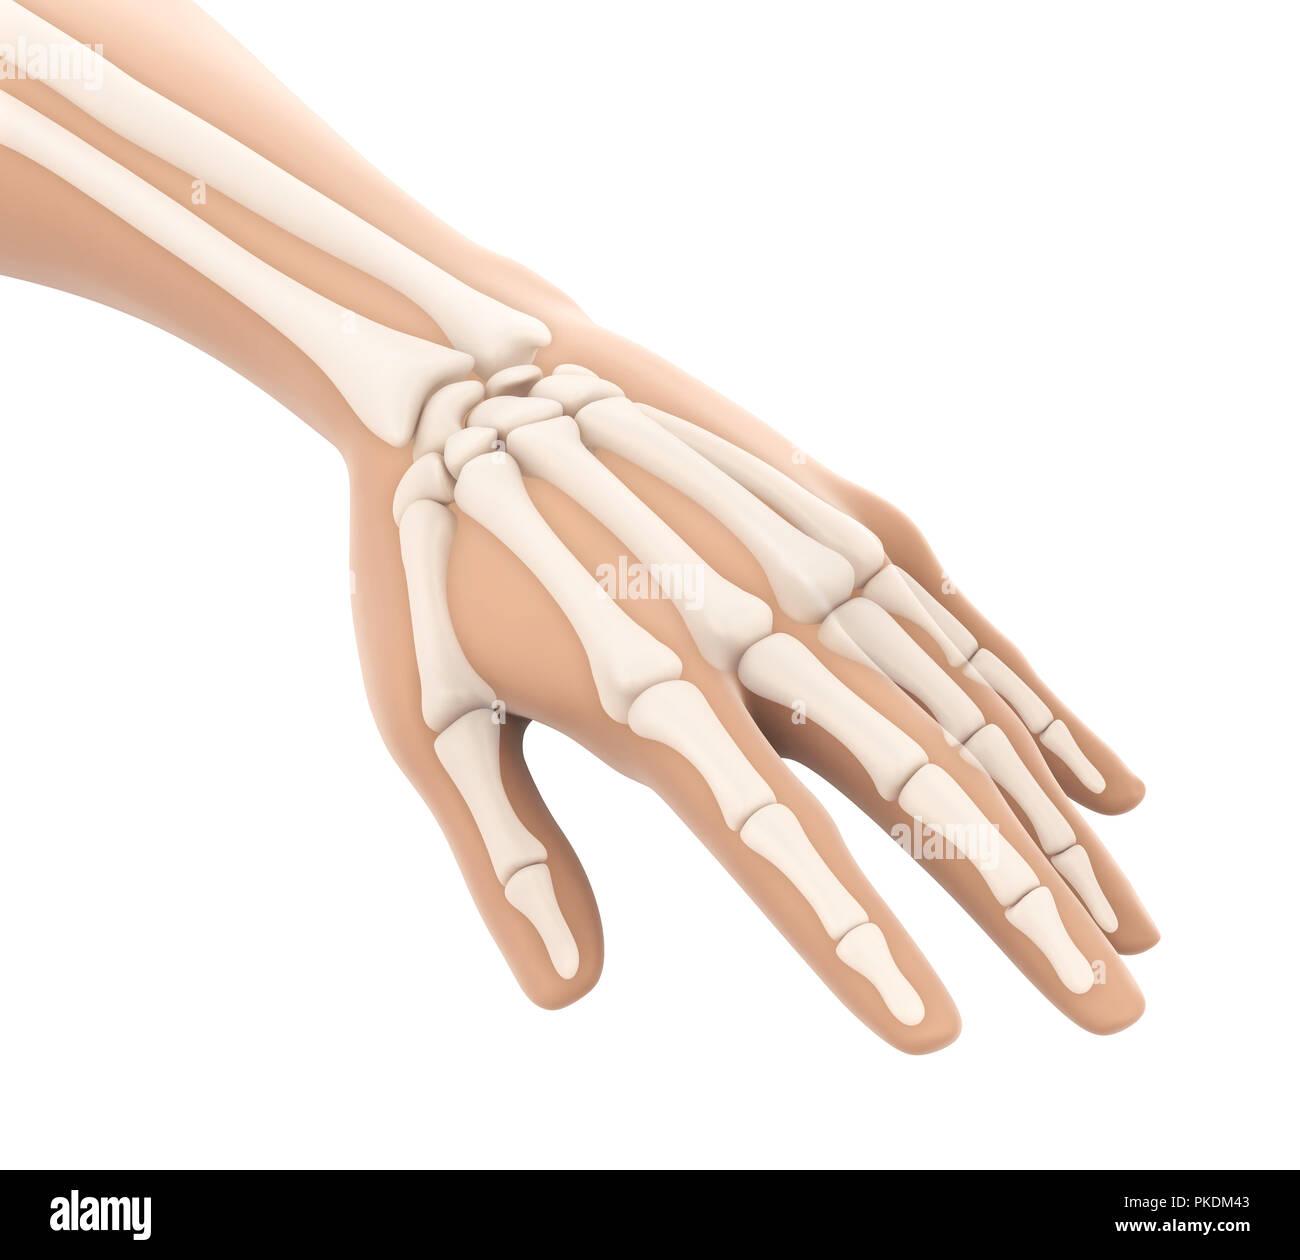 Human Hand Anatomy Illustration Stock Photo 218504051 Alamy